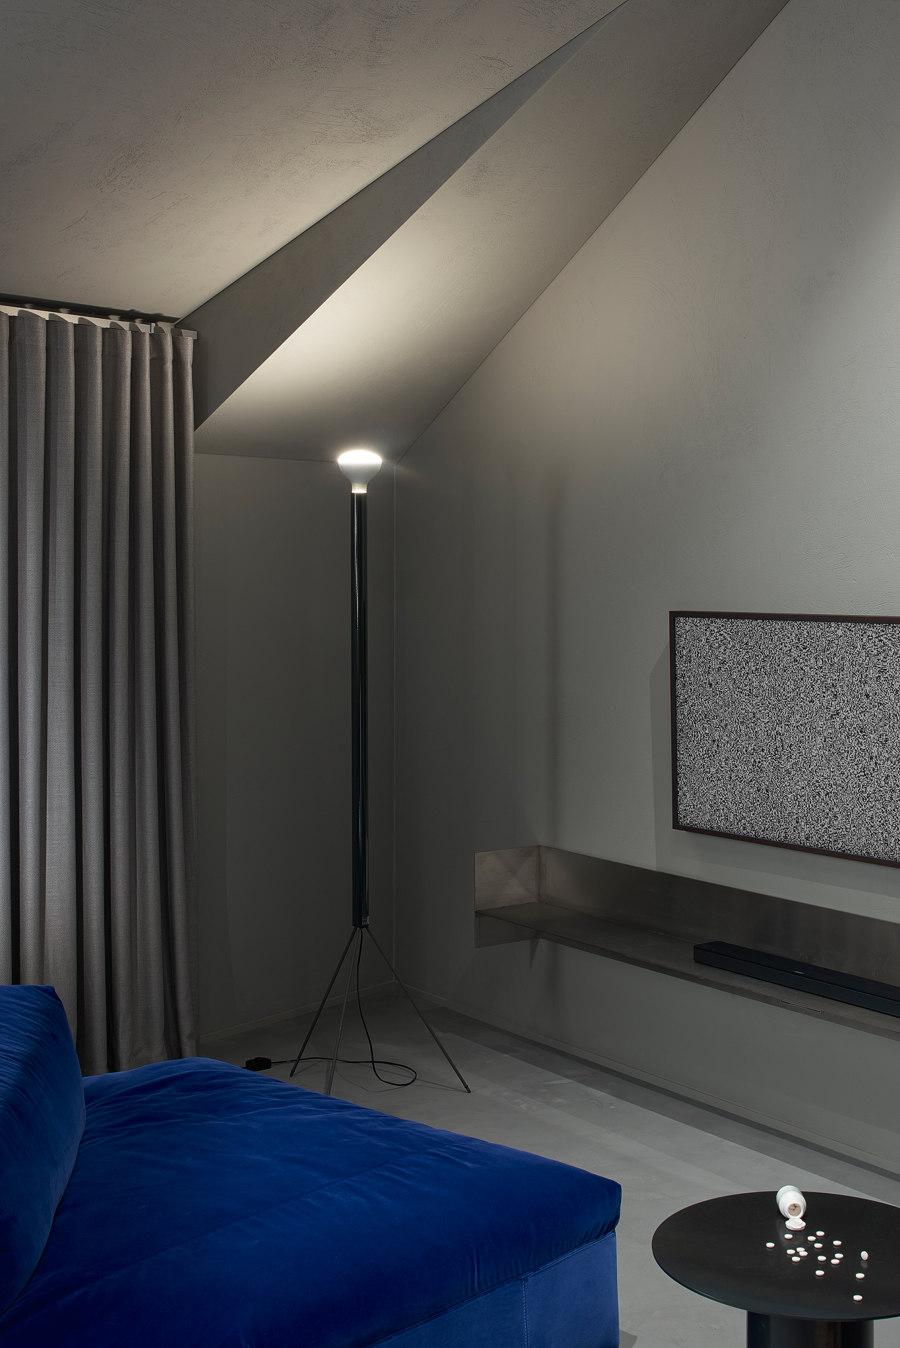 Apartment in Labdariu street, Vilnius by AKTA | Living space